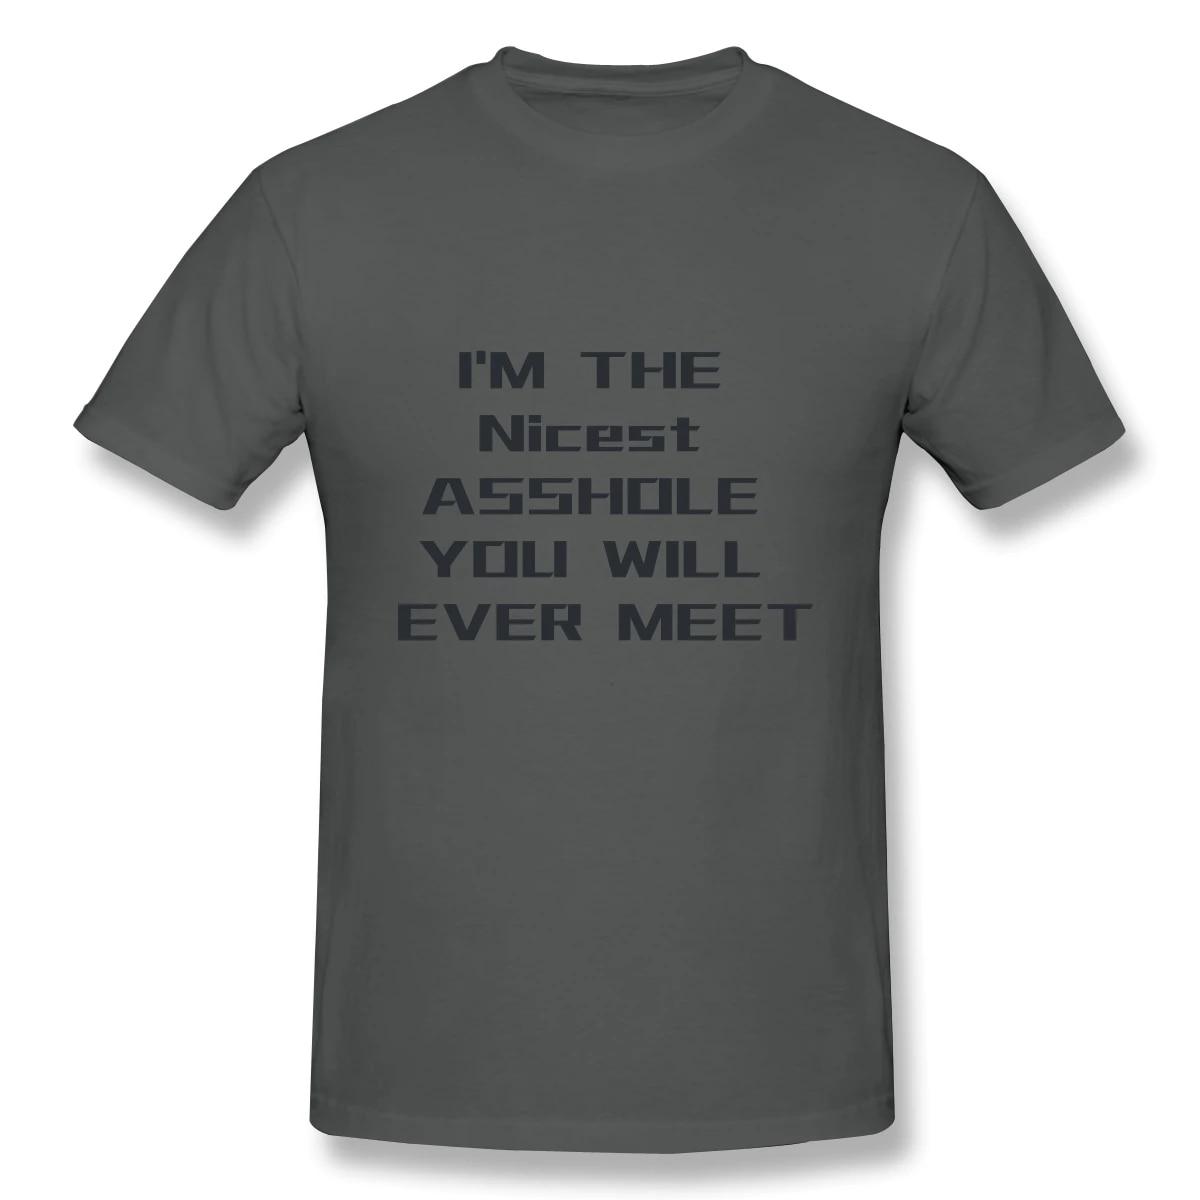 Asshole Shirt Cool Mens Shirt Crazy Shirt Sarcastic T Shirt Shirt For Asshole Nice Guy Gifts Rude Shirts Men Funny Shirt For Men